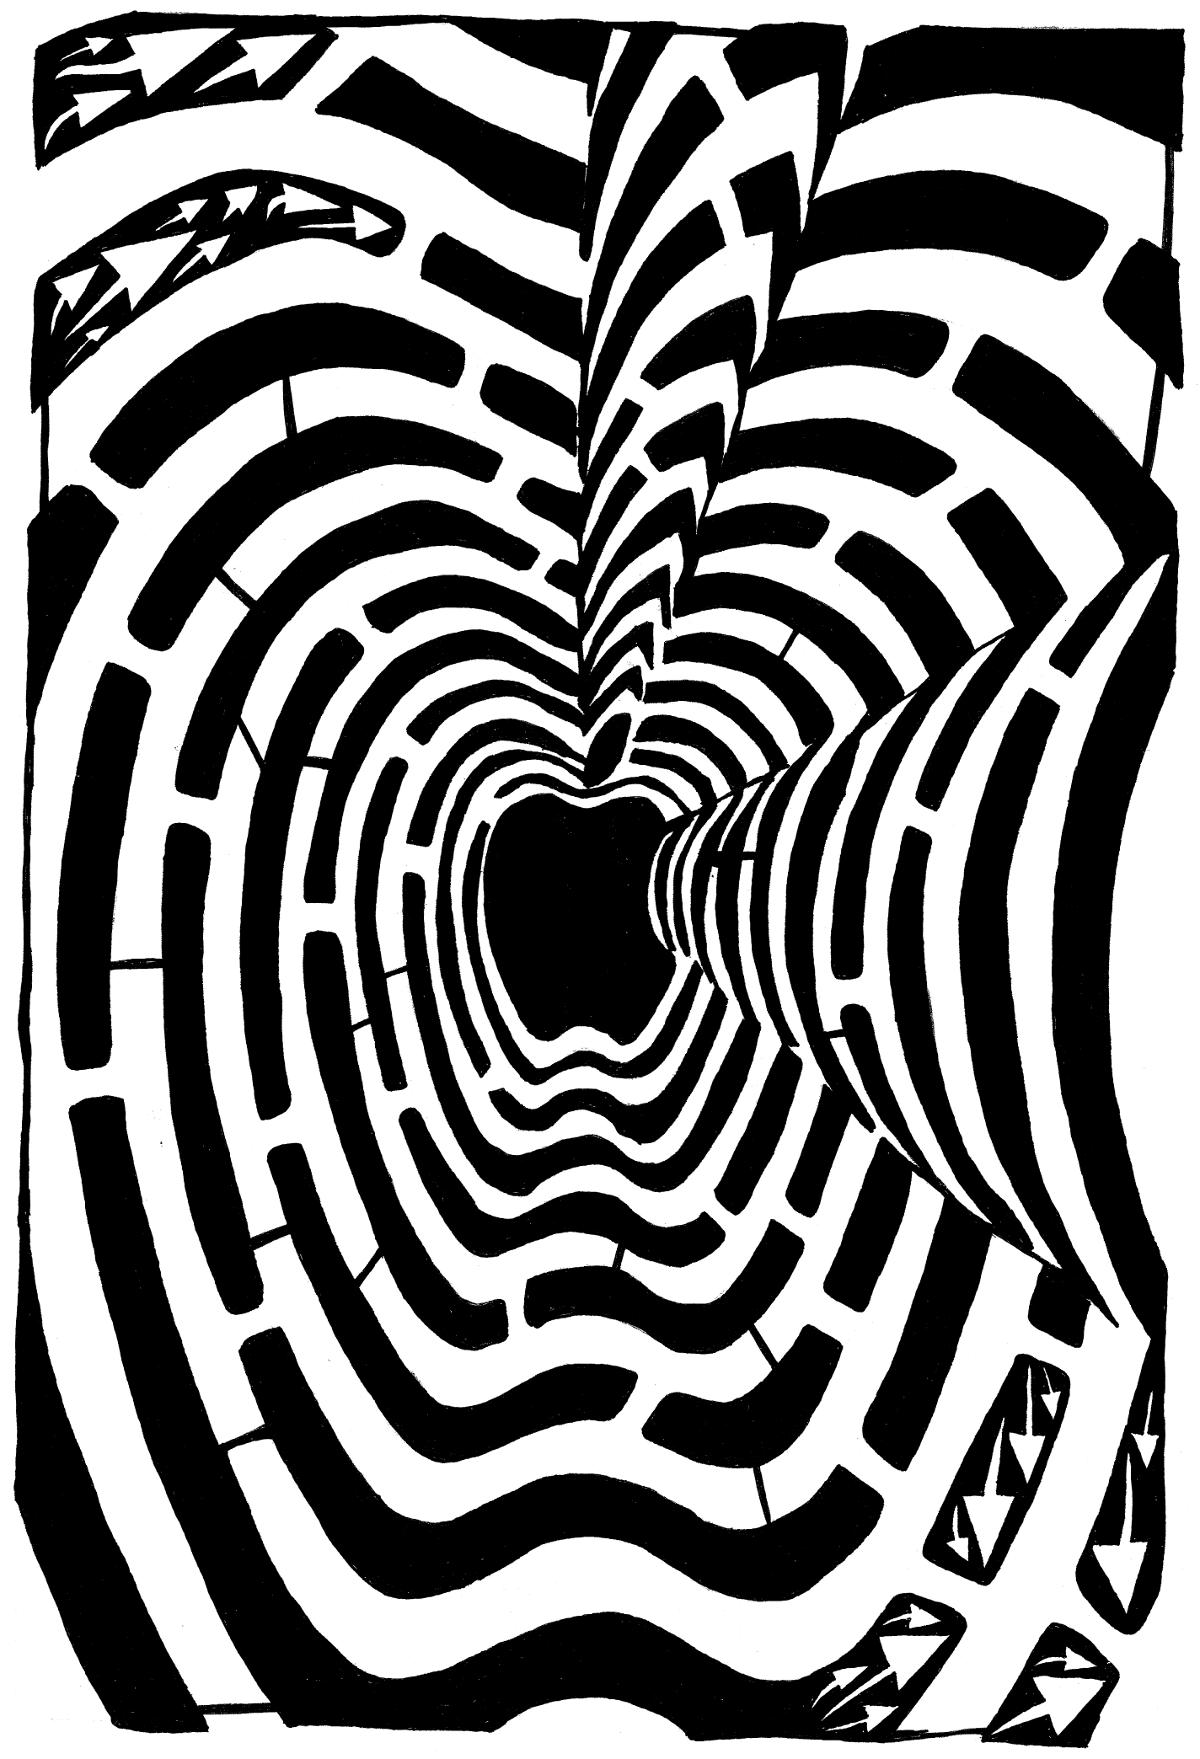 Maze of an Optical Illusion Maze by Yonatan Frimer